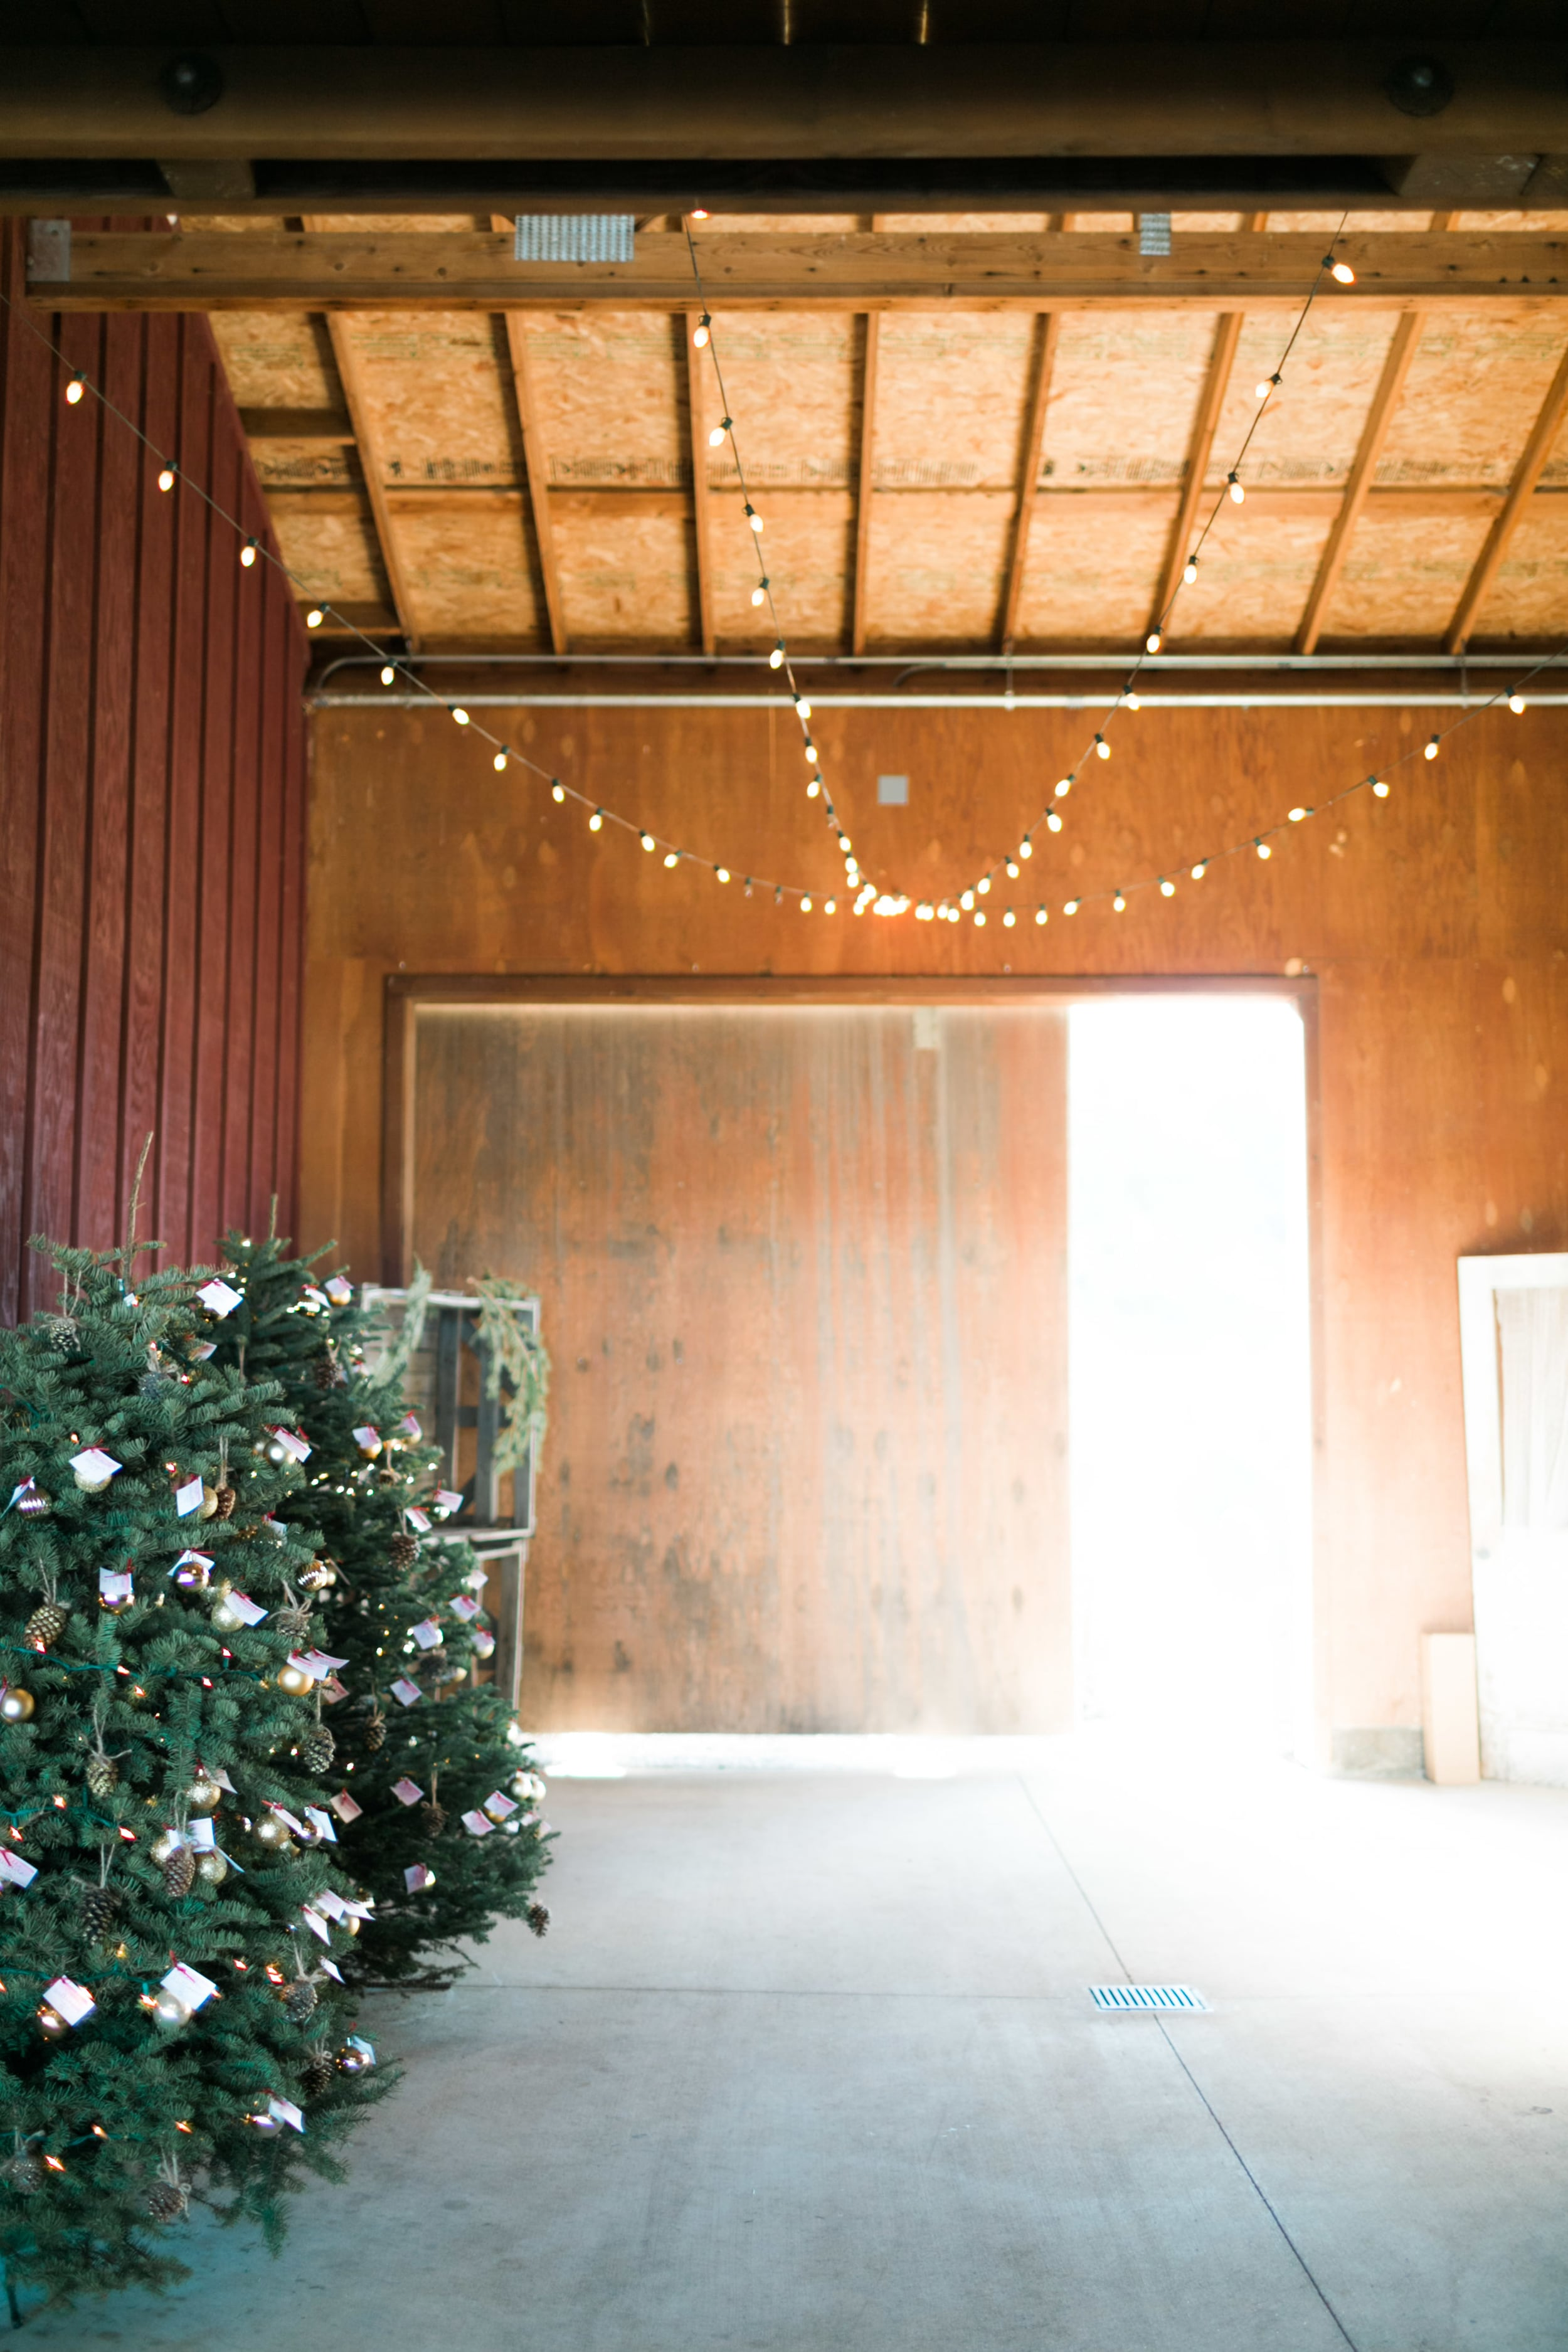 Natalie_Schutt_Photography_Winter_Wedding_San_Luis_Obispo-84.jpg